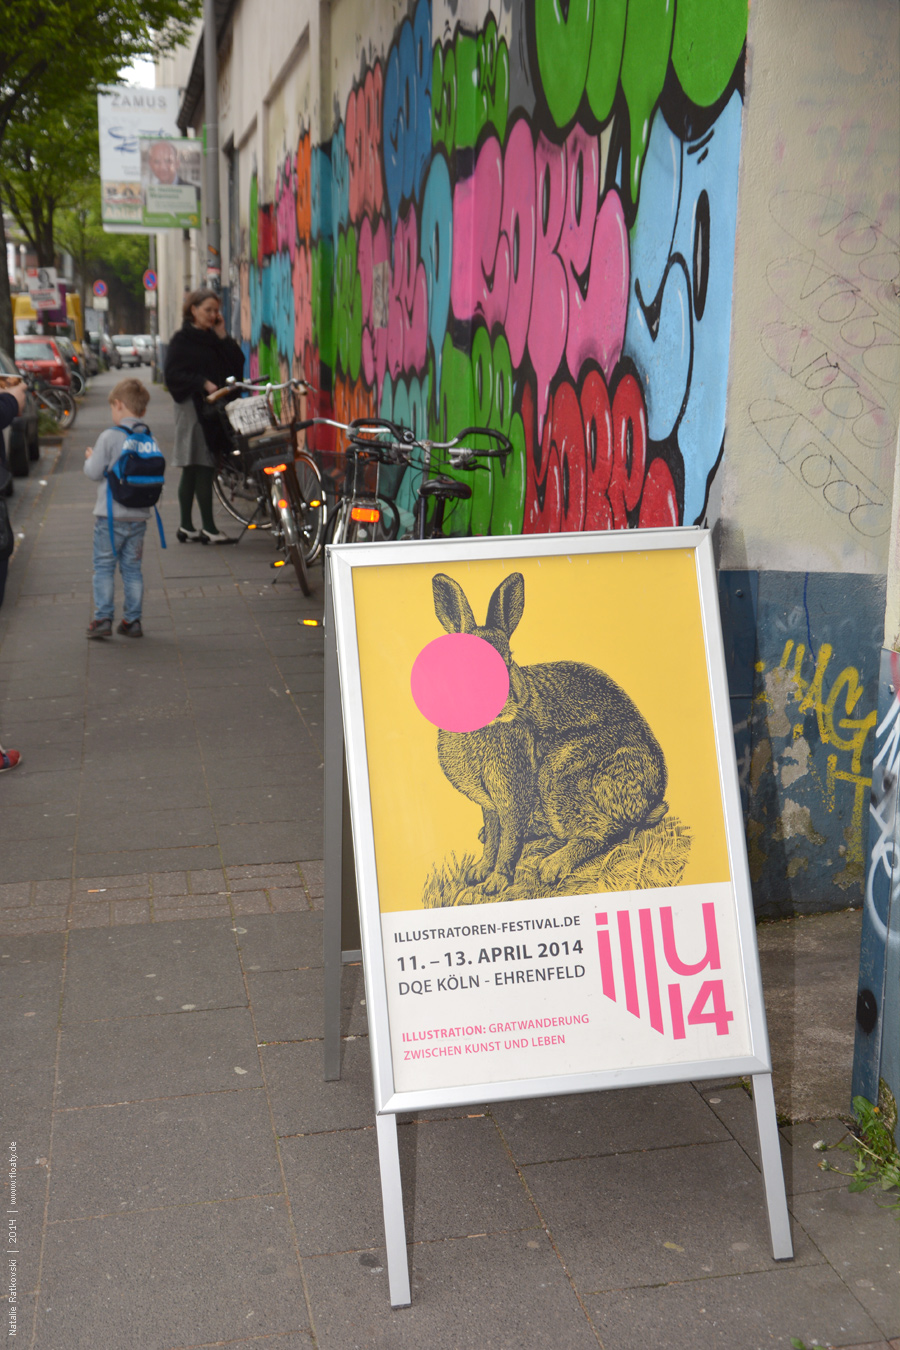 Illu 14, Cologne